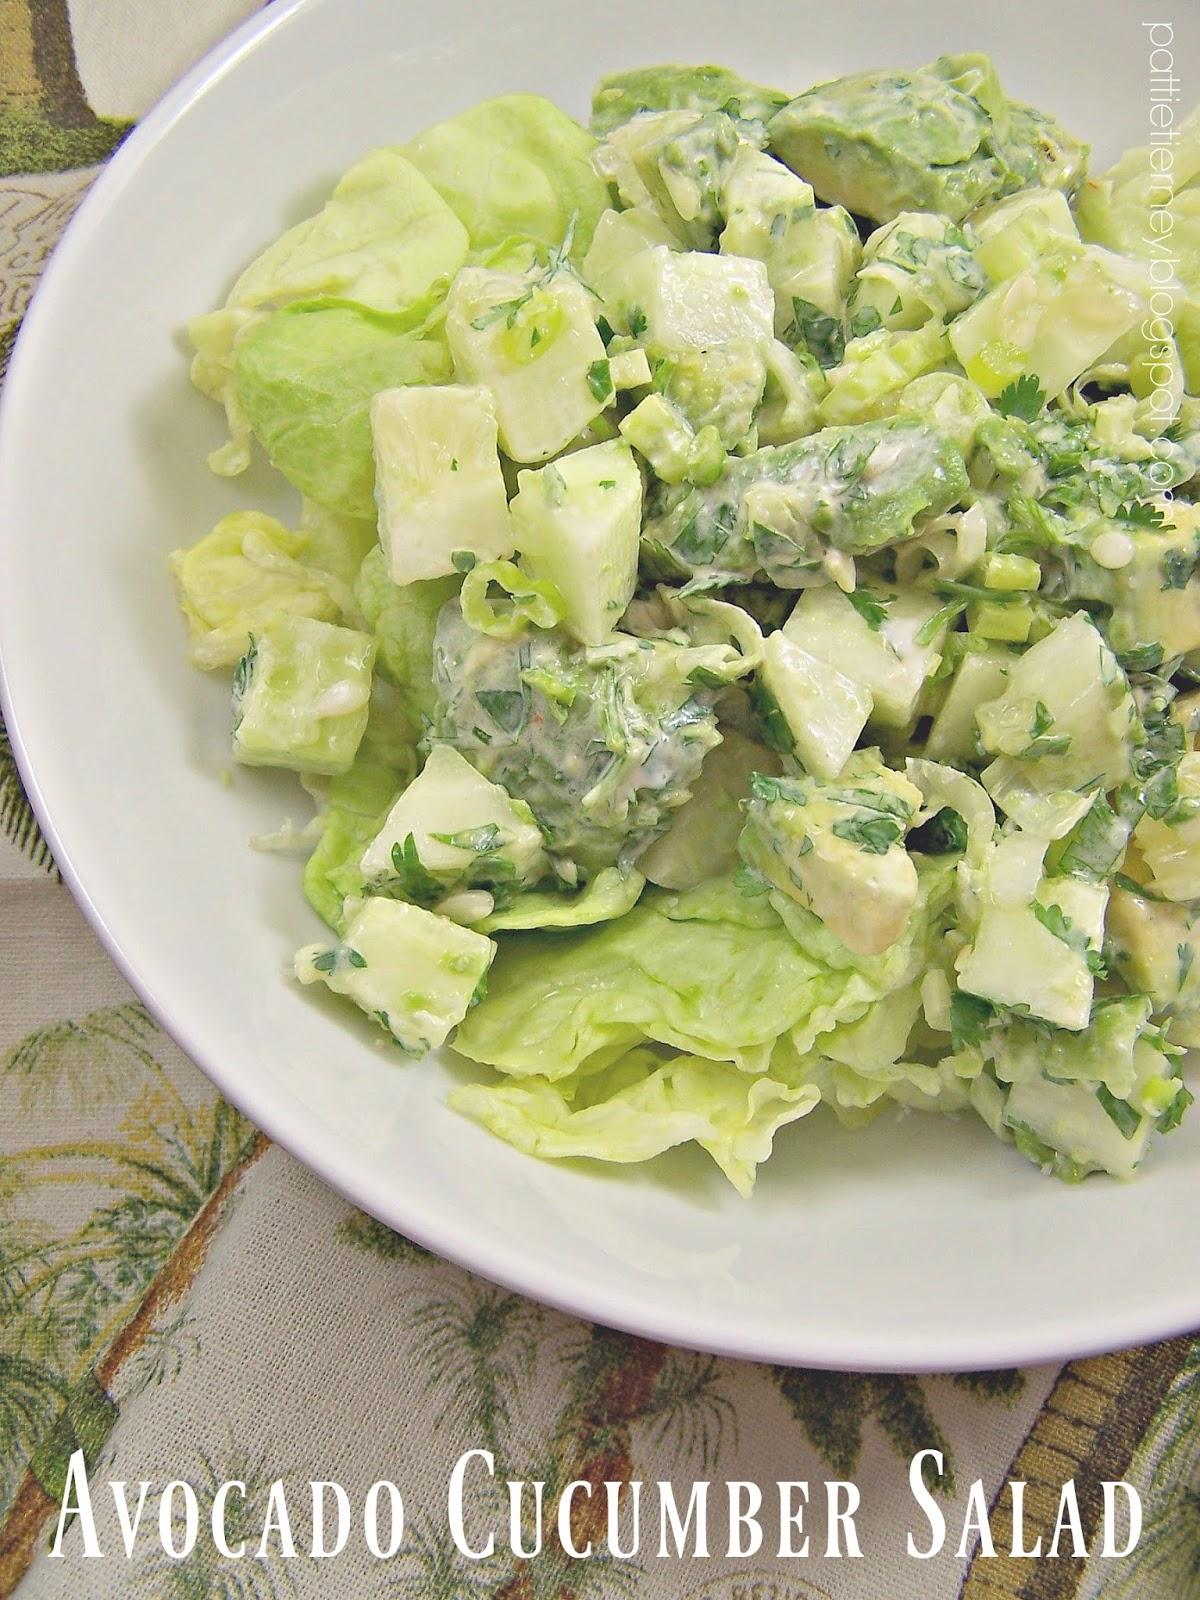 Olla Podrida Avocado Cucumber Salad